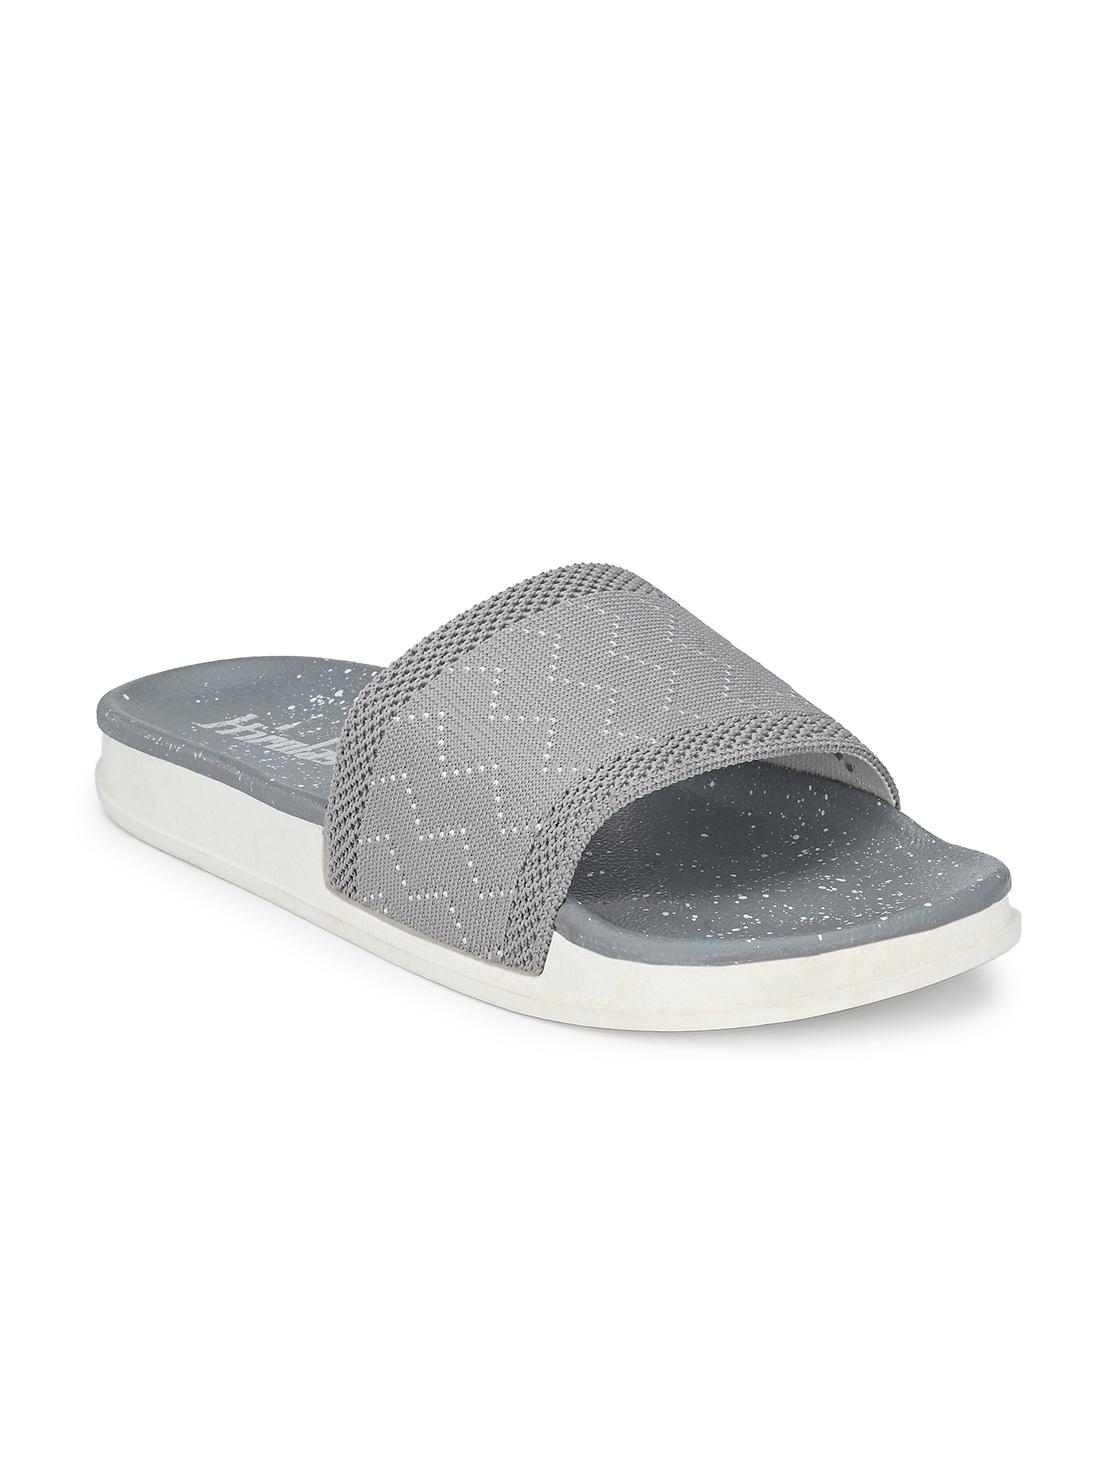 Hirolas | Hirolas® Women Knitted Slipper Sliders - Grey